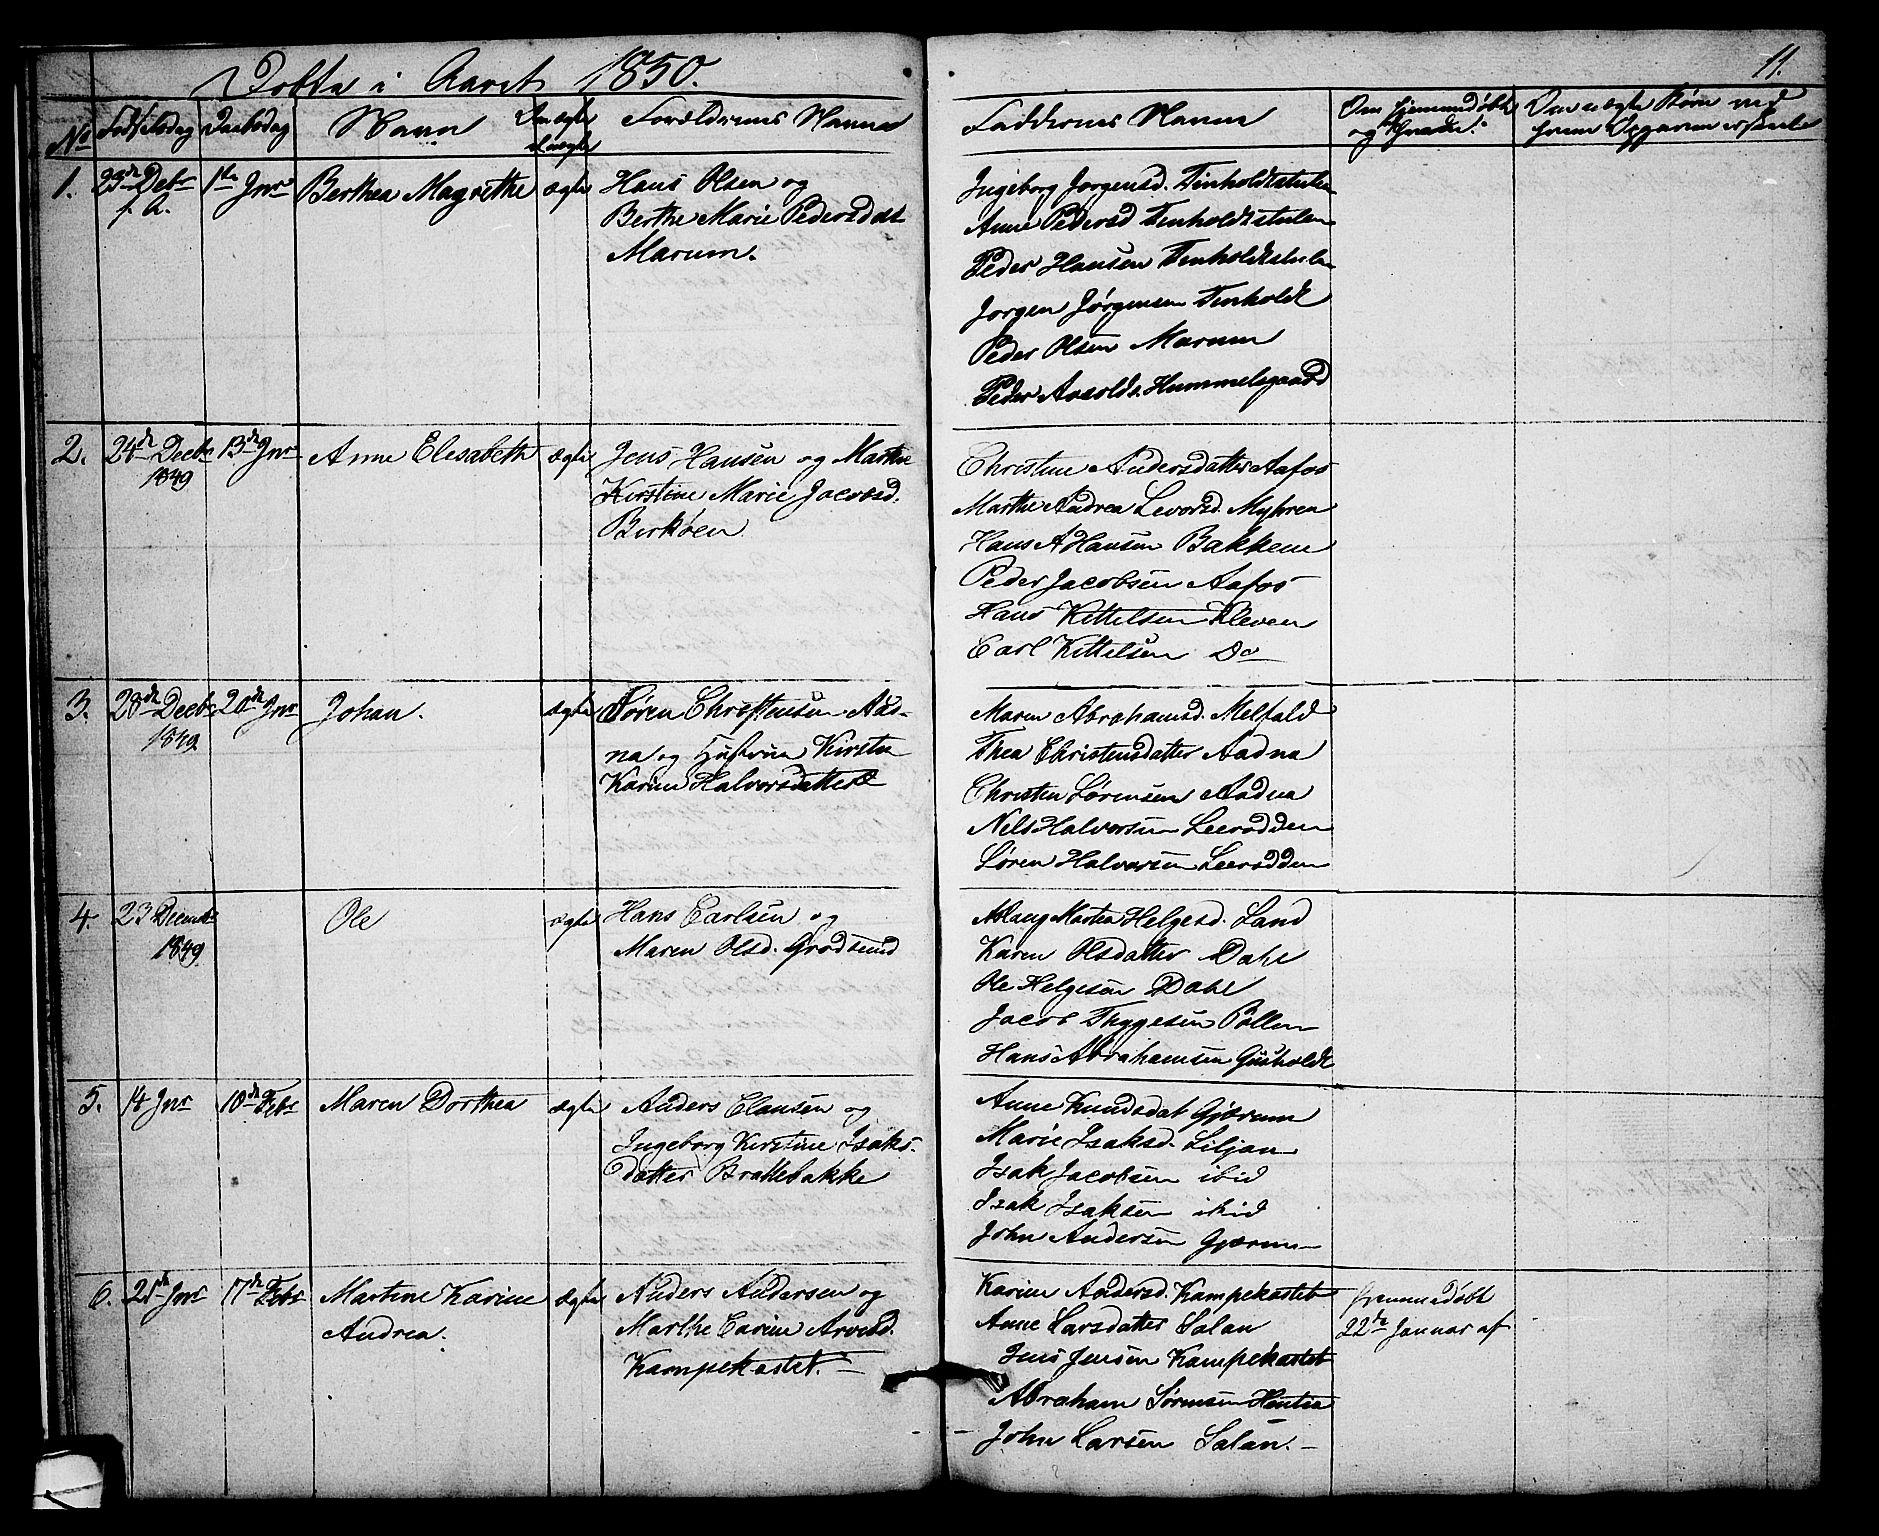 SAKO, Solum kirkebøker, G/Gb/L0001: Klokkerbok nr. II 1, 1848-1859, s. 11